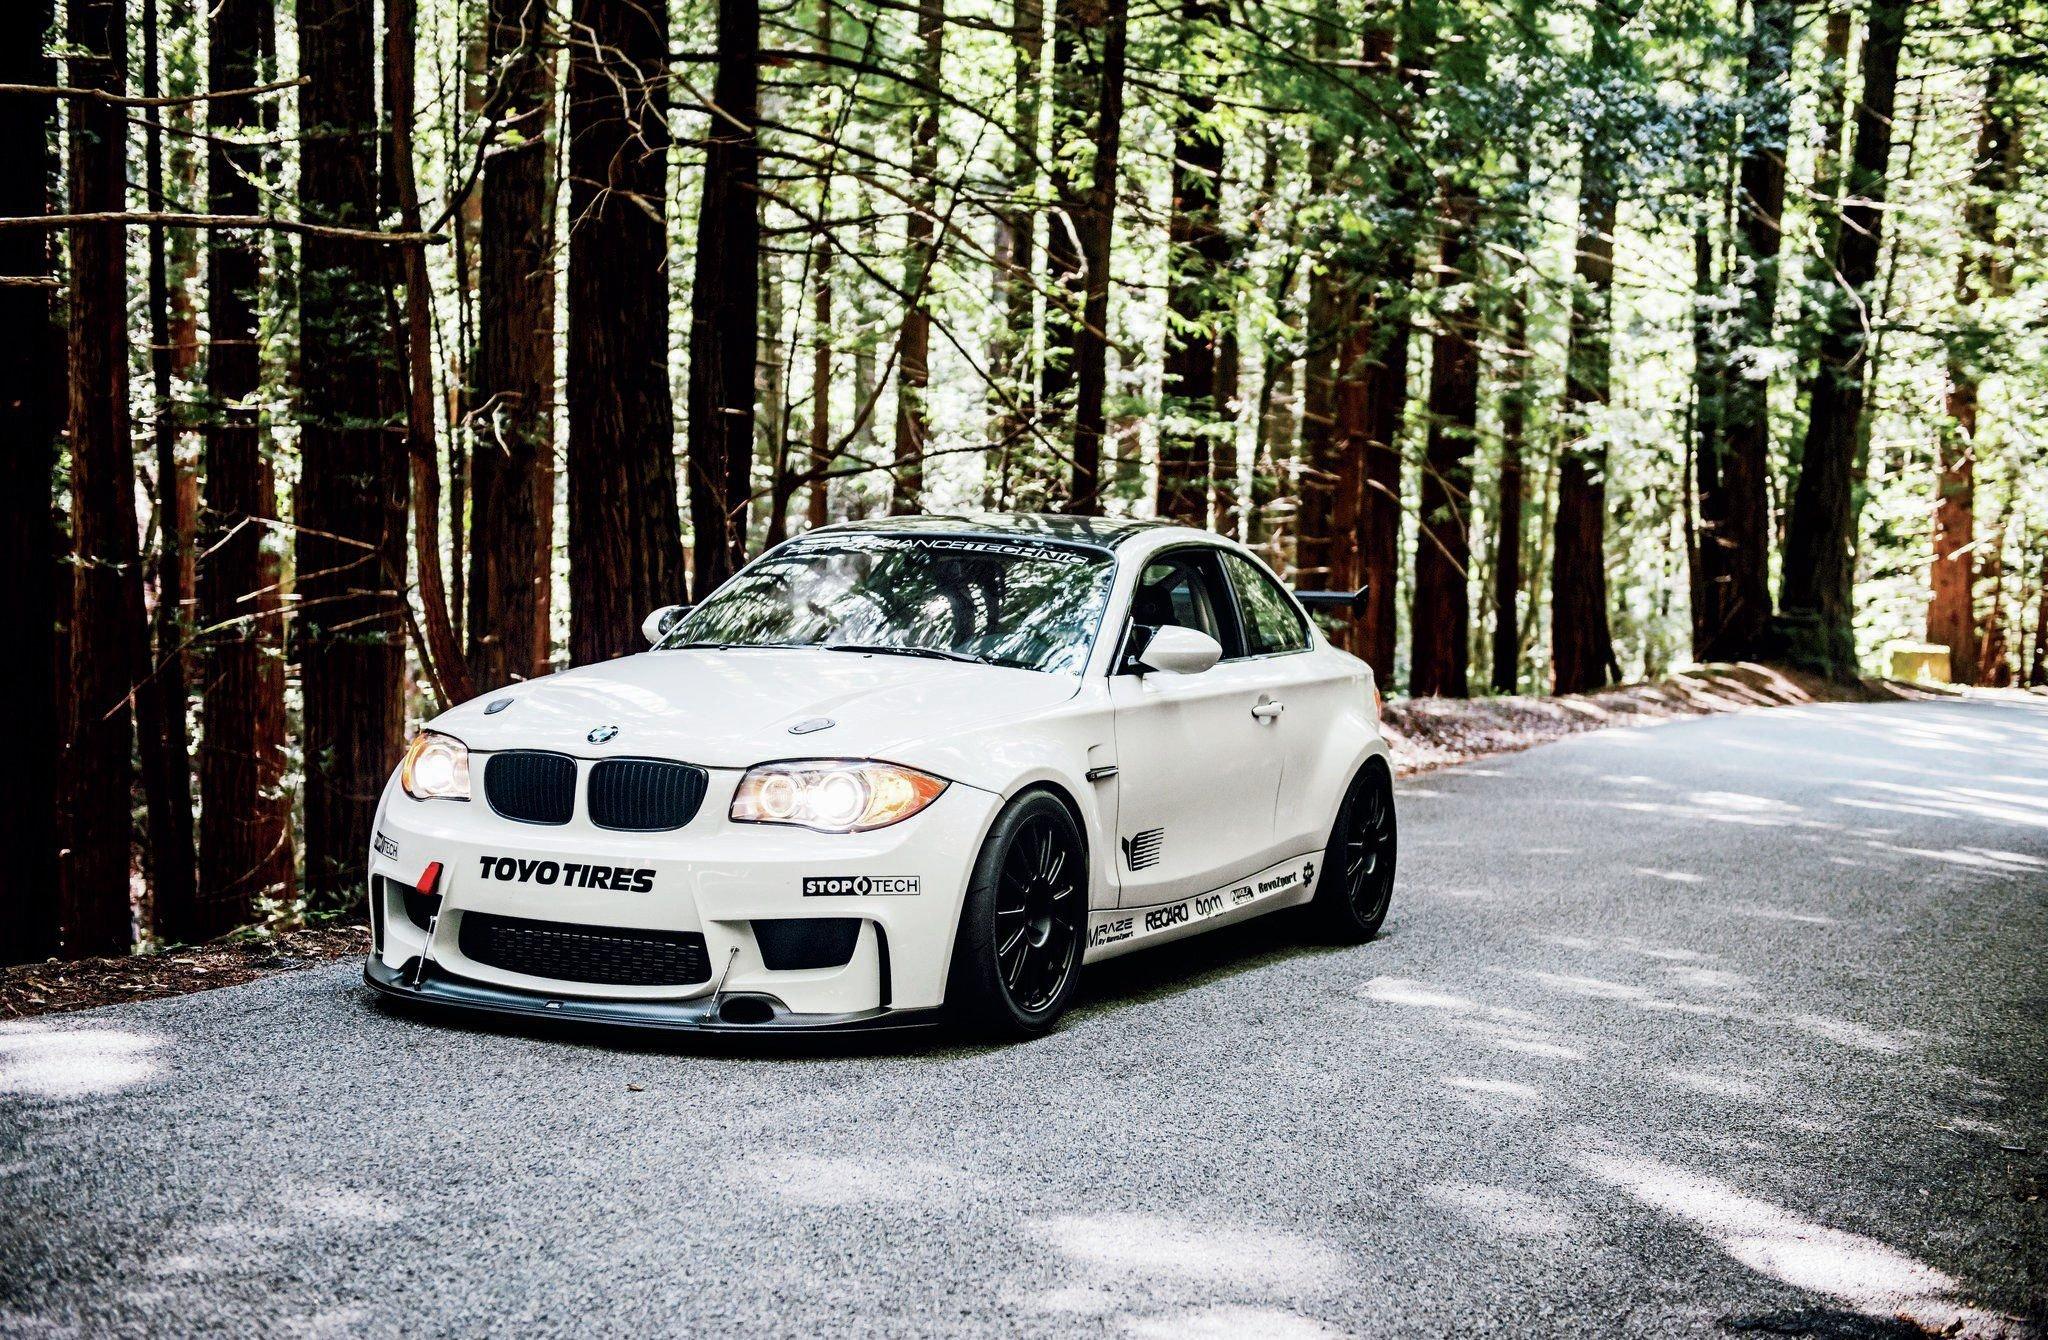 2008 BMW 135i BMW performance cars tuning wallpaper 2048x1340 2048x1340